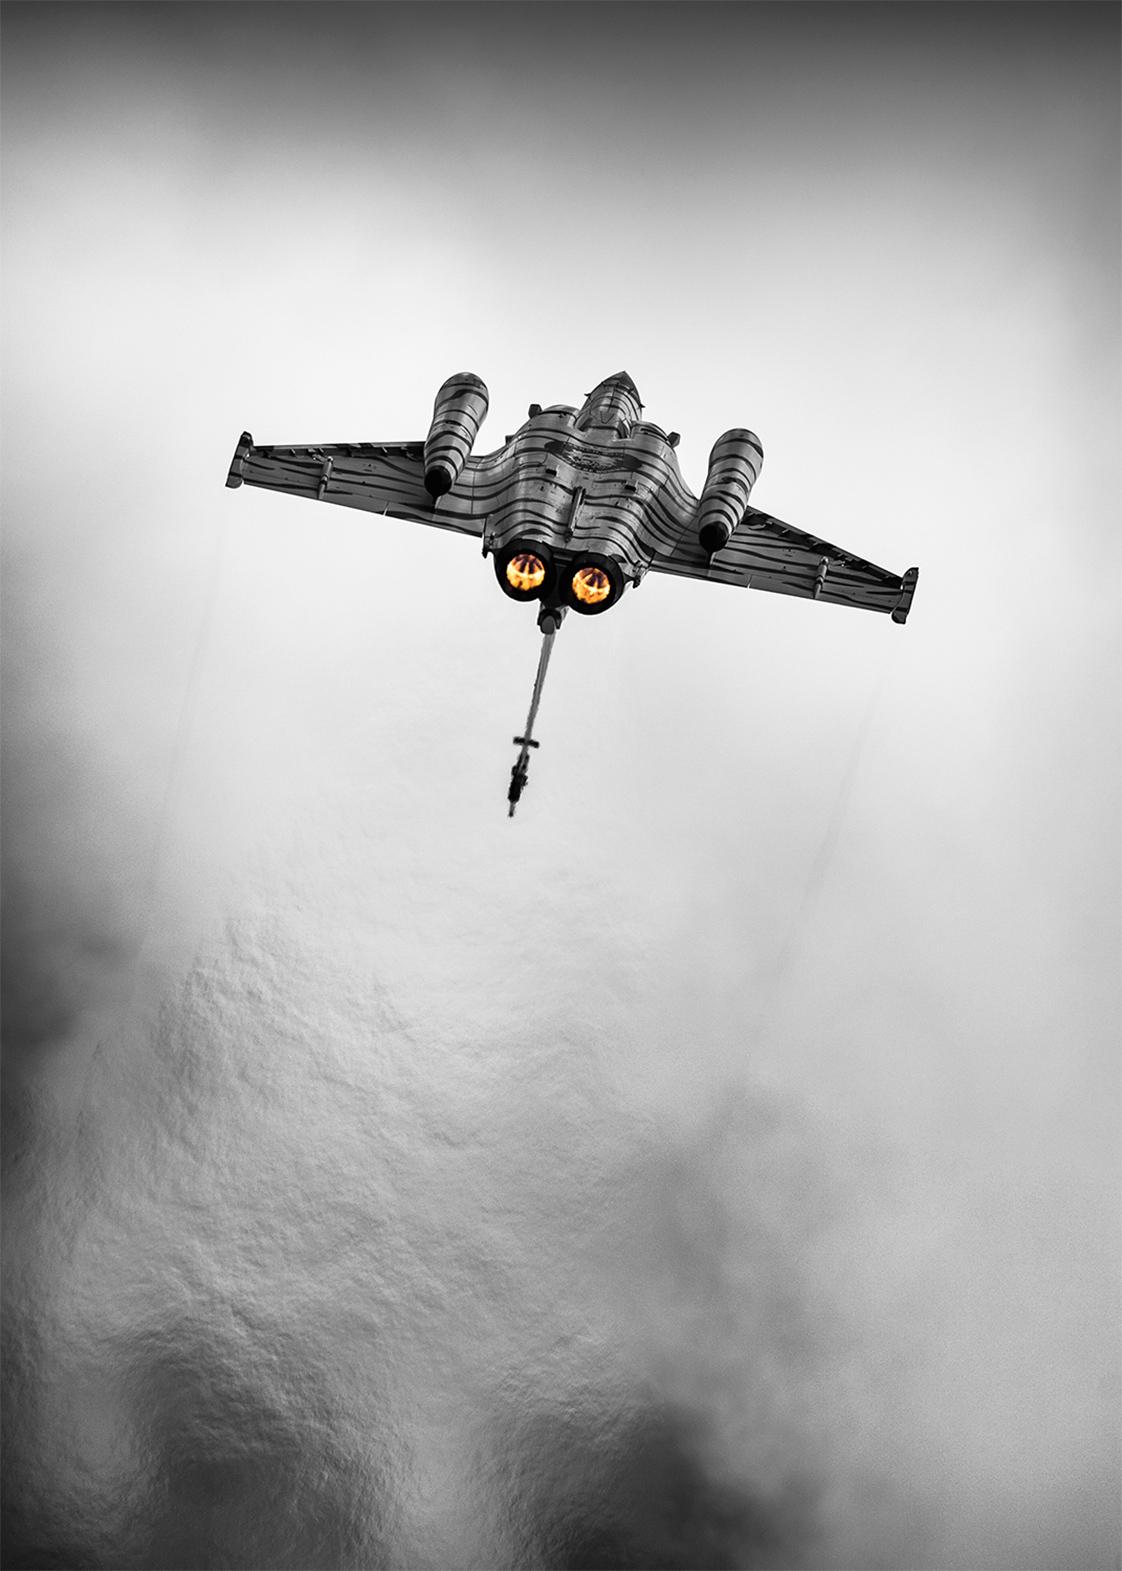 photographie-avion-tiger-meet-2